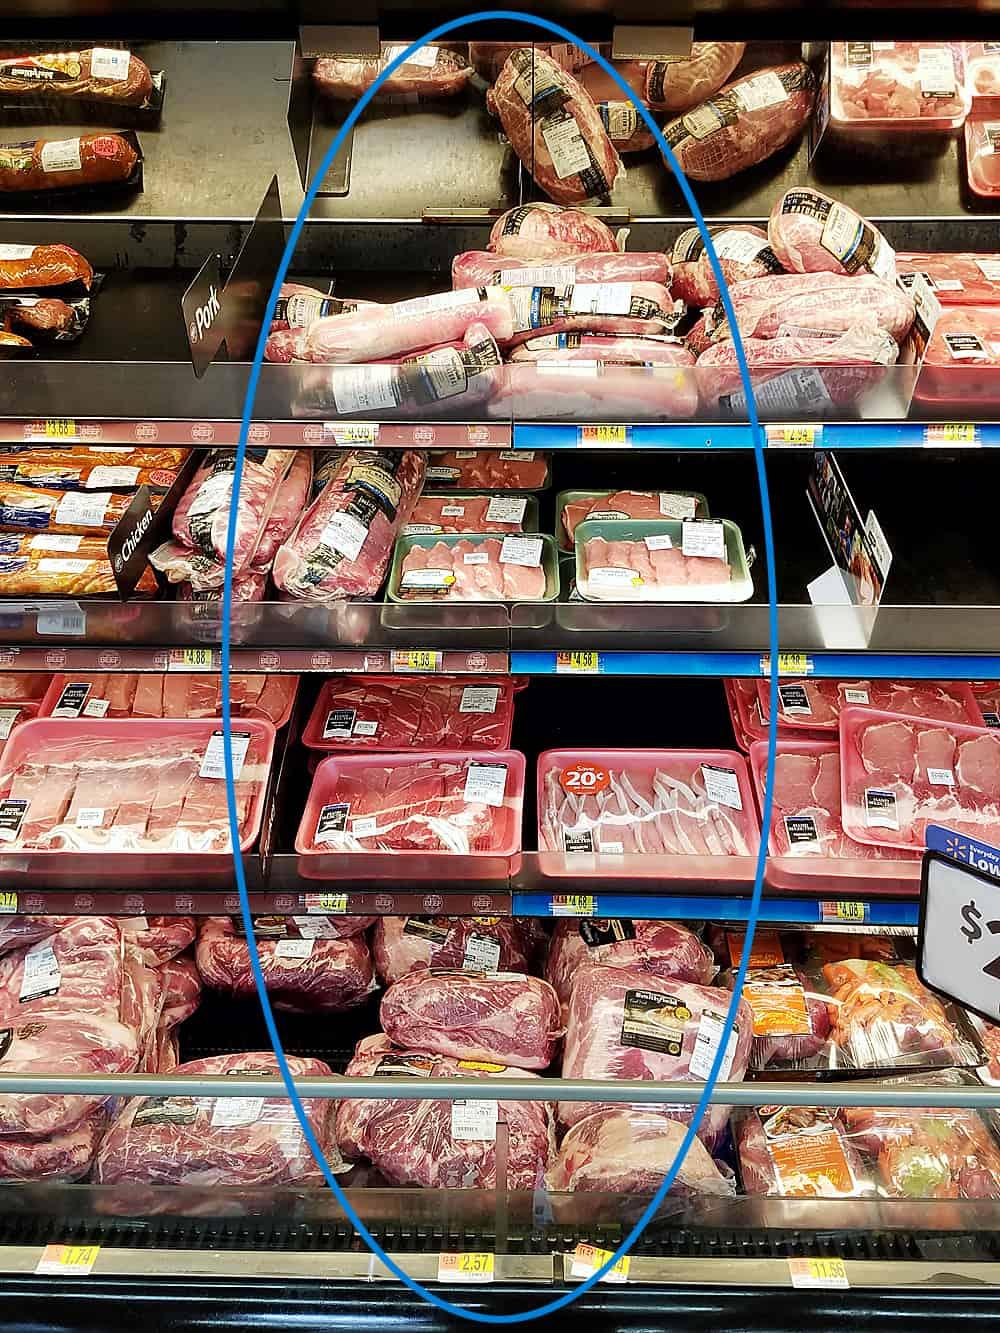 Smithfield All Natural Fresh Pork at Walmart